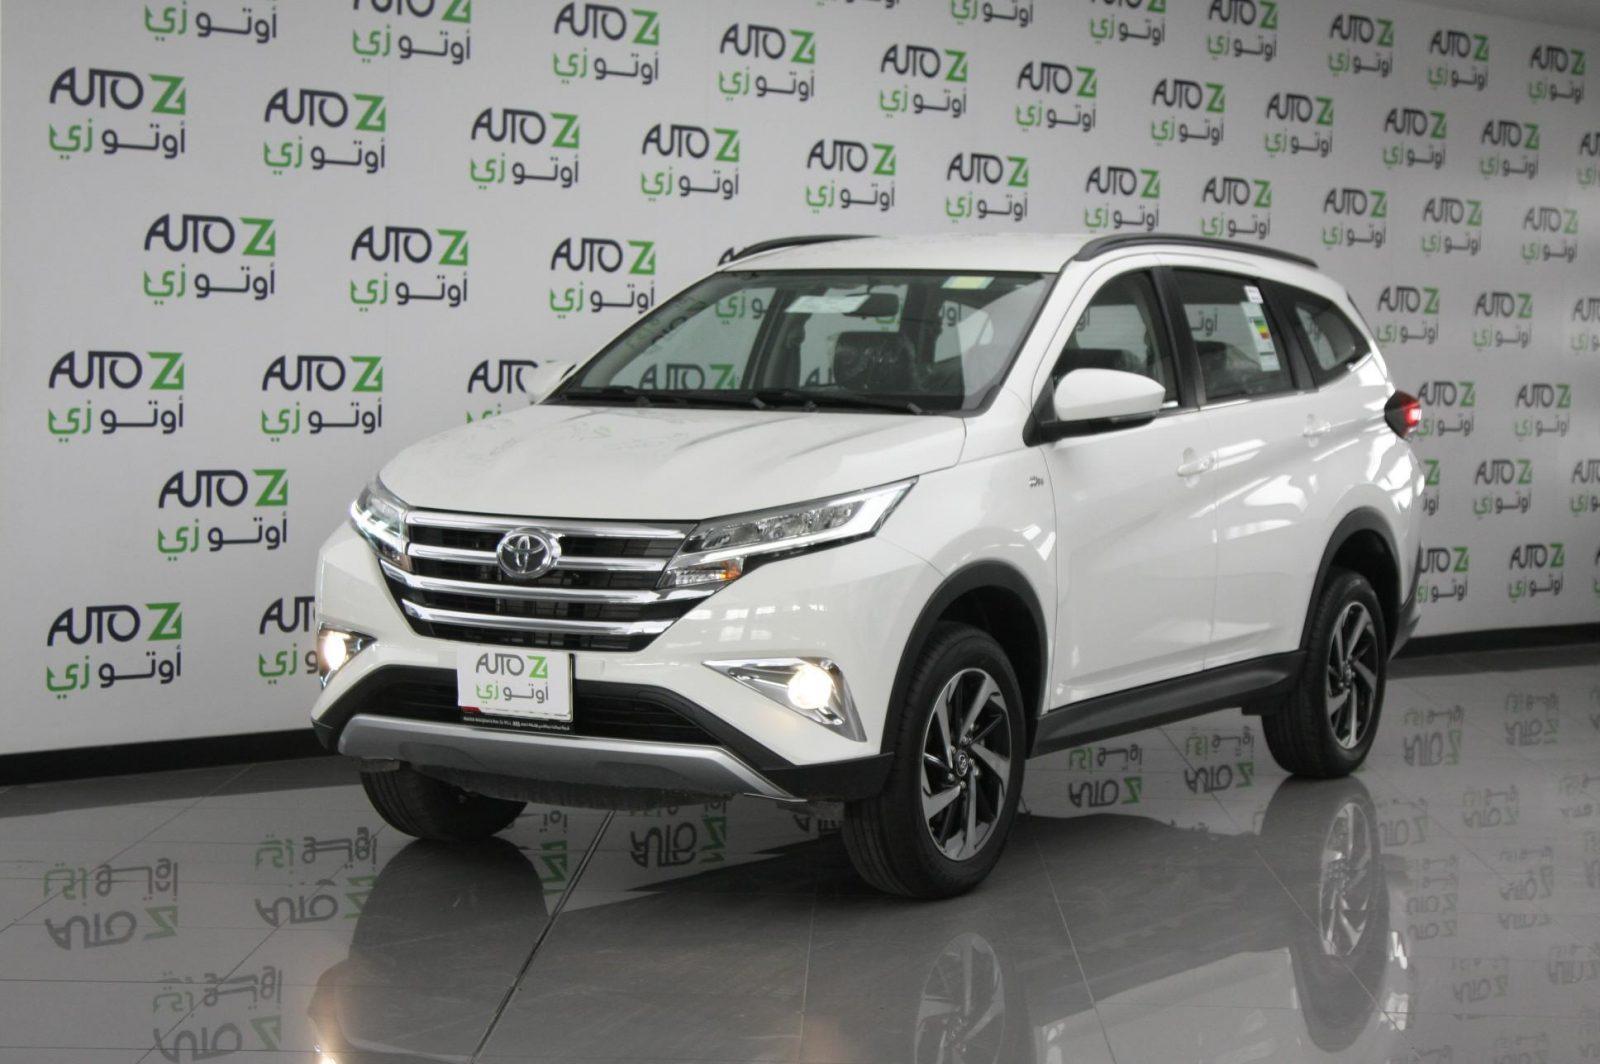 Kelebihan Toyota Rush 2019 Harga Spesifikasi